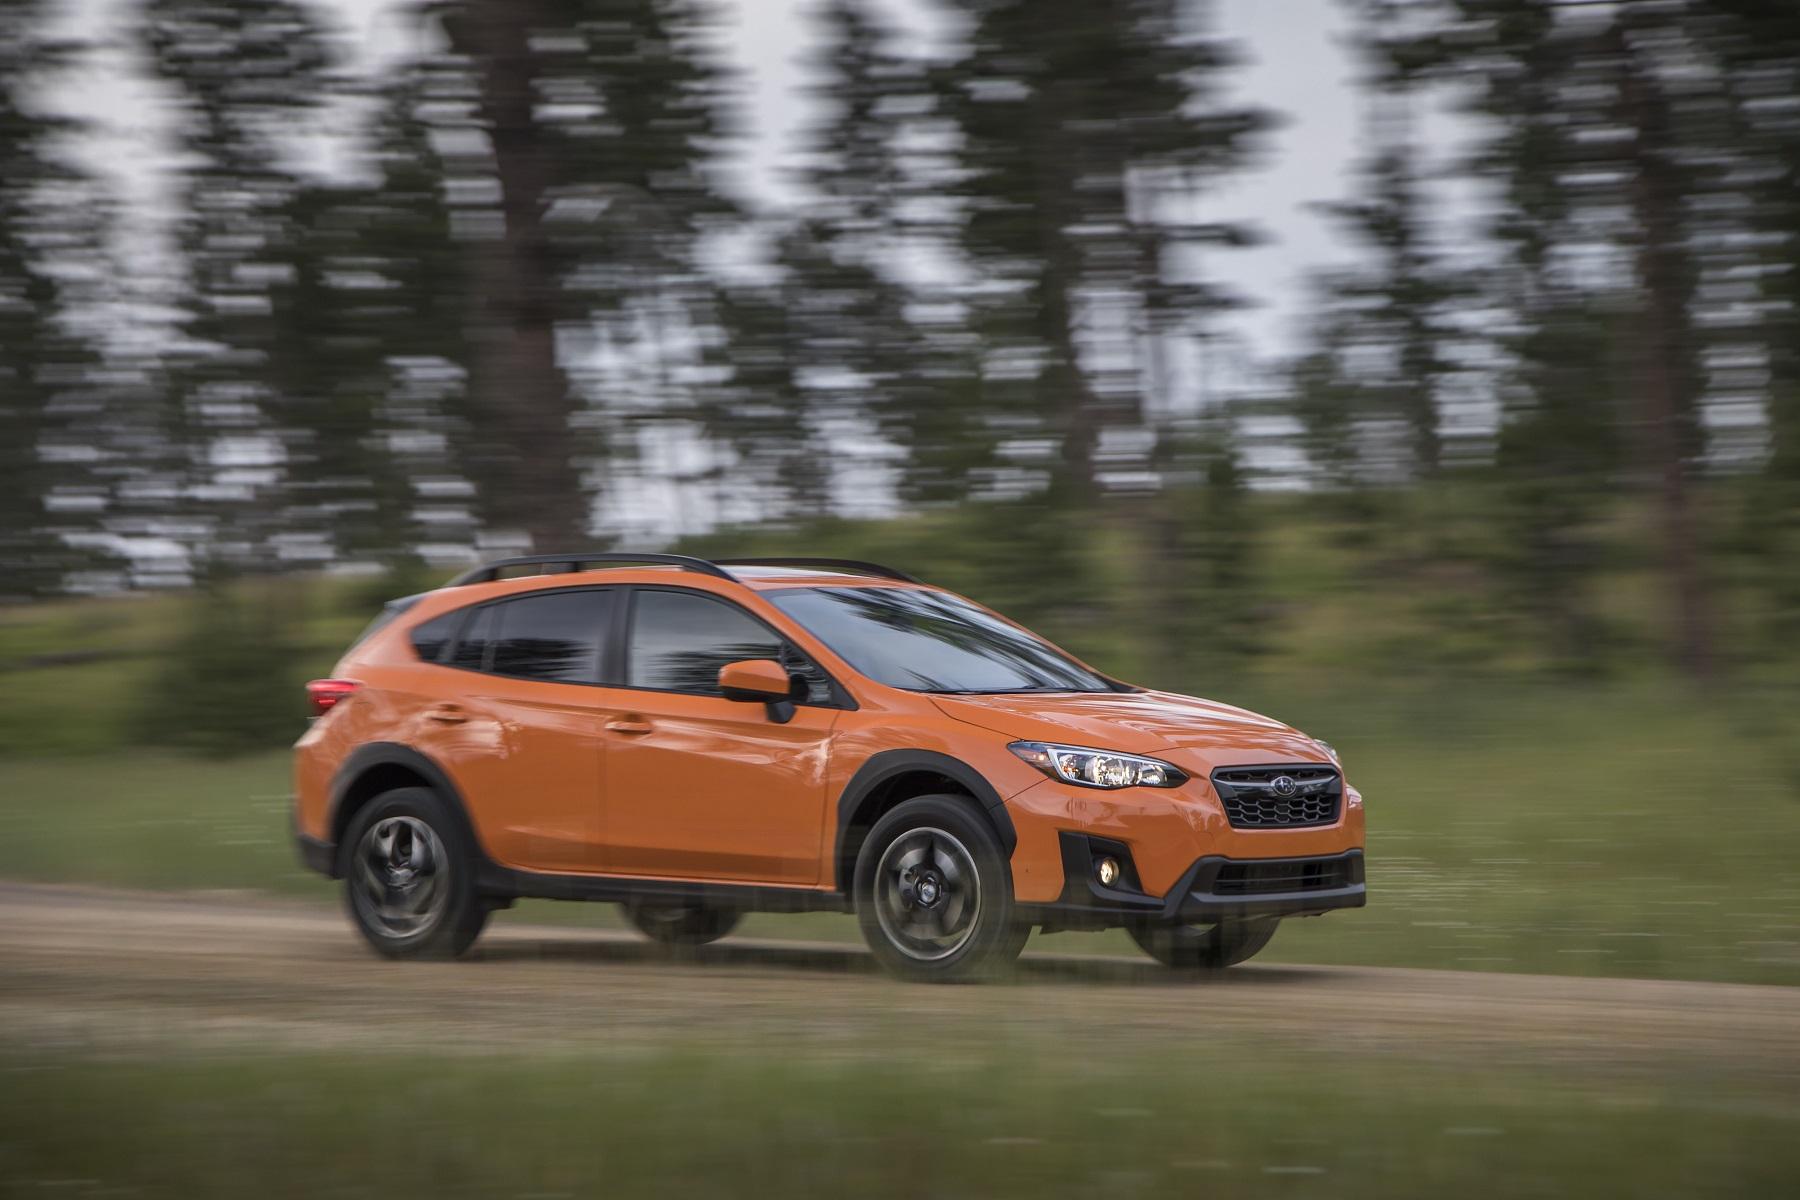 Subaru Crosstrek Off Road >> Pursuing Off Road Wonders In 2018 Subaru Crosstrek Get Off The